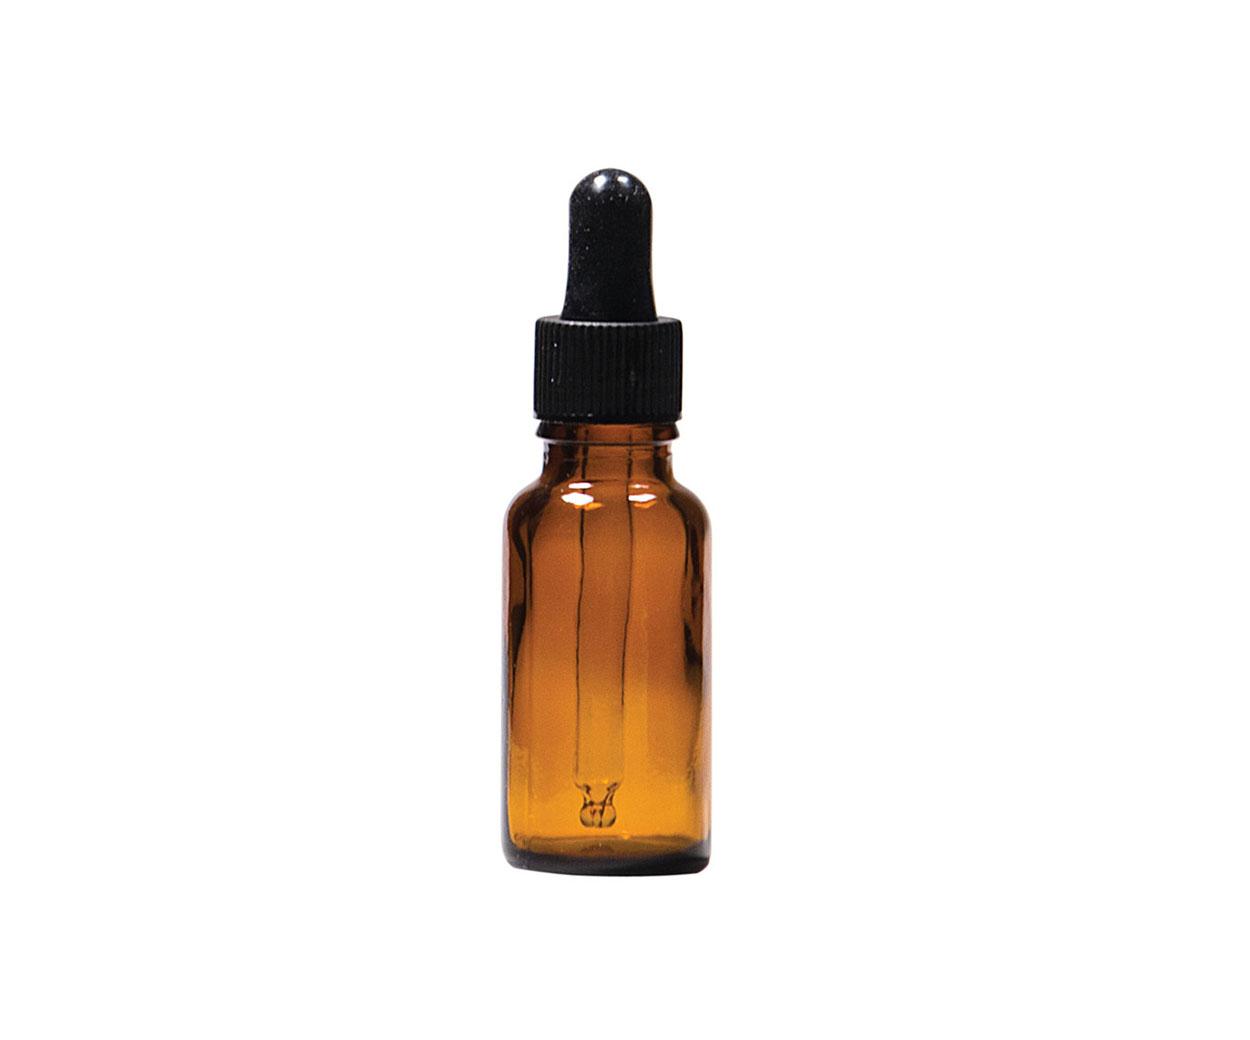 20ml Dropper Bottle - Pack of 12